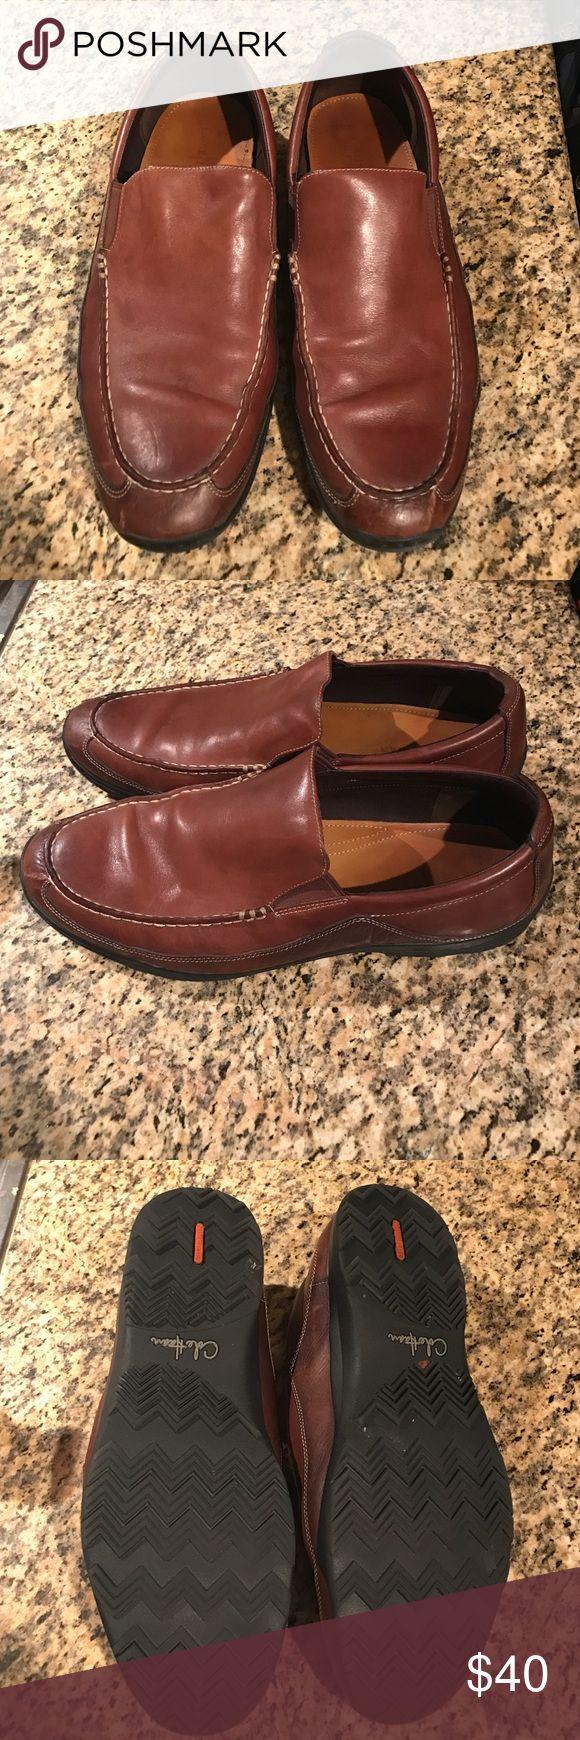 Cole Haan slip-on loafers Cole Haan brown slip-on loafers. Lightly worn Cole Haan Shoes Loafers & Slip-Ons